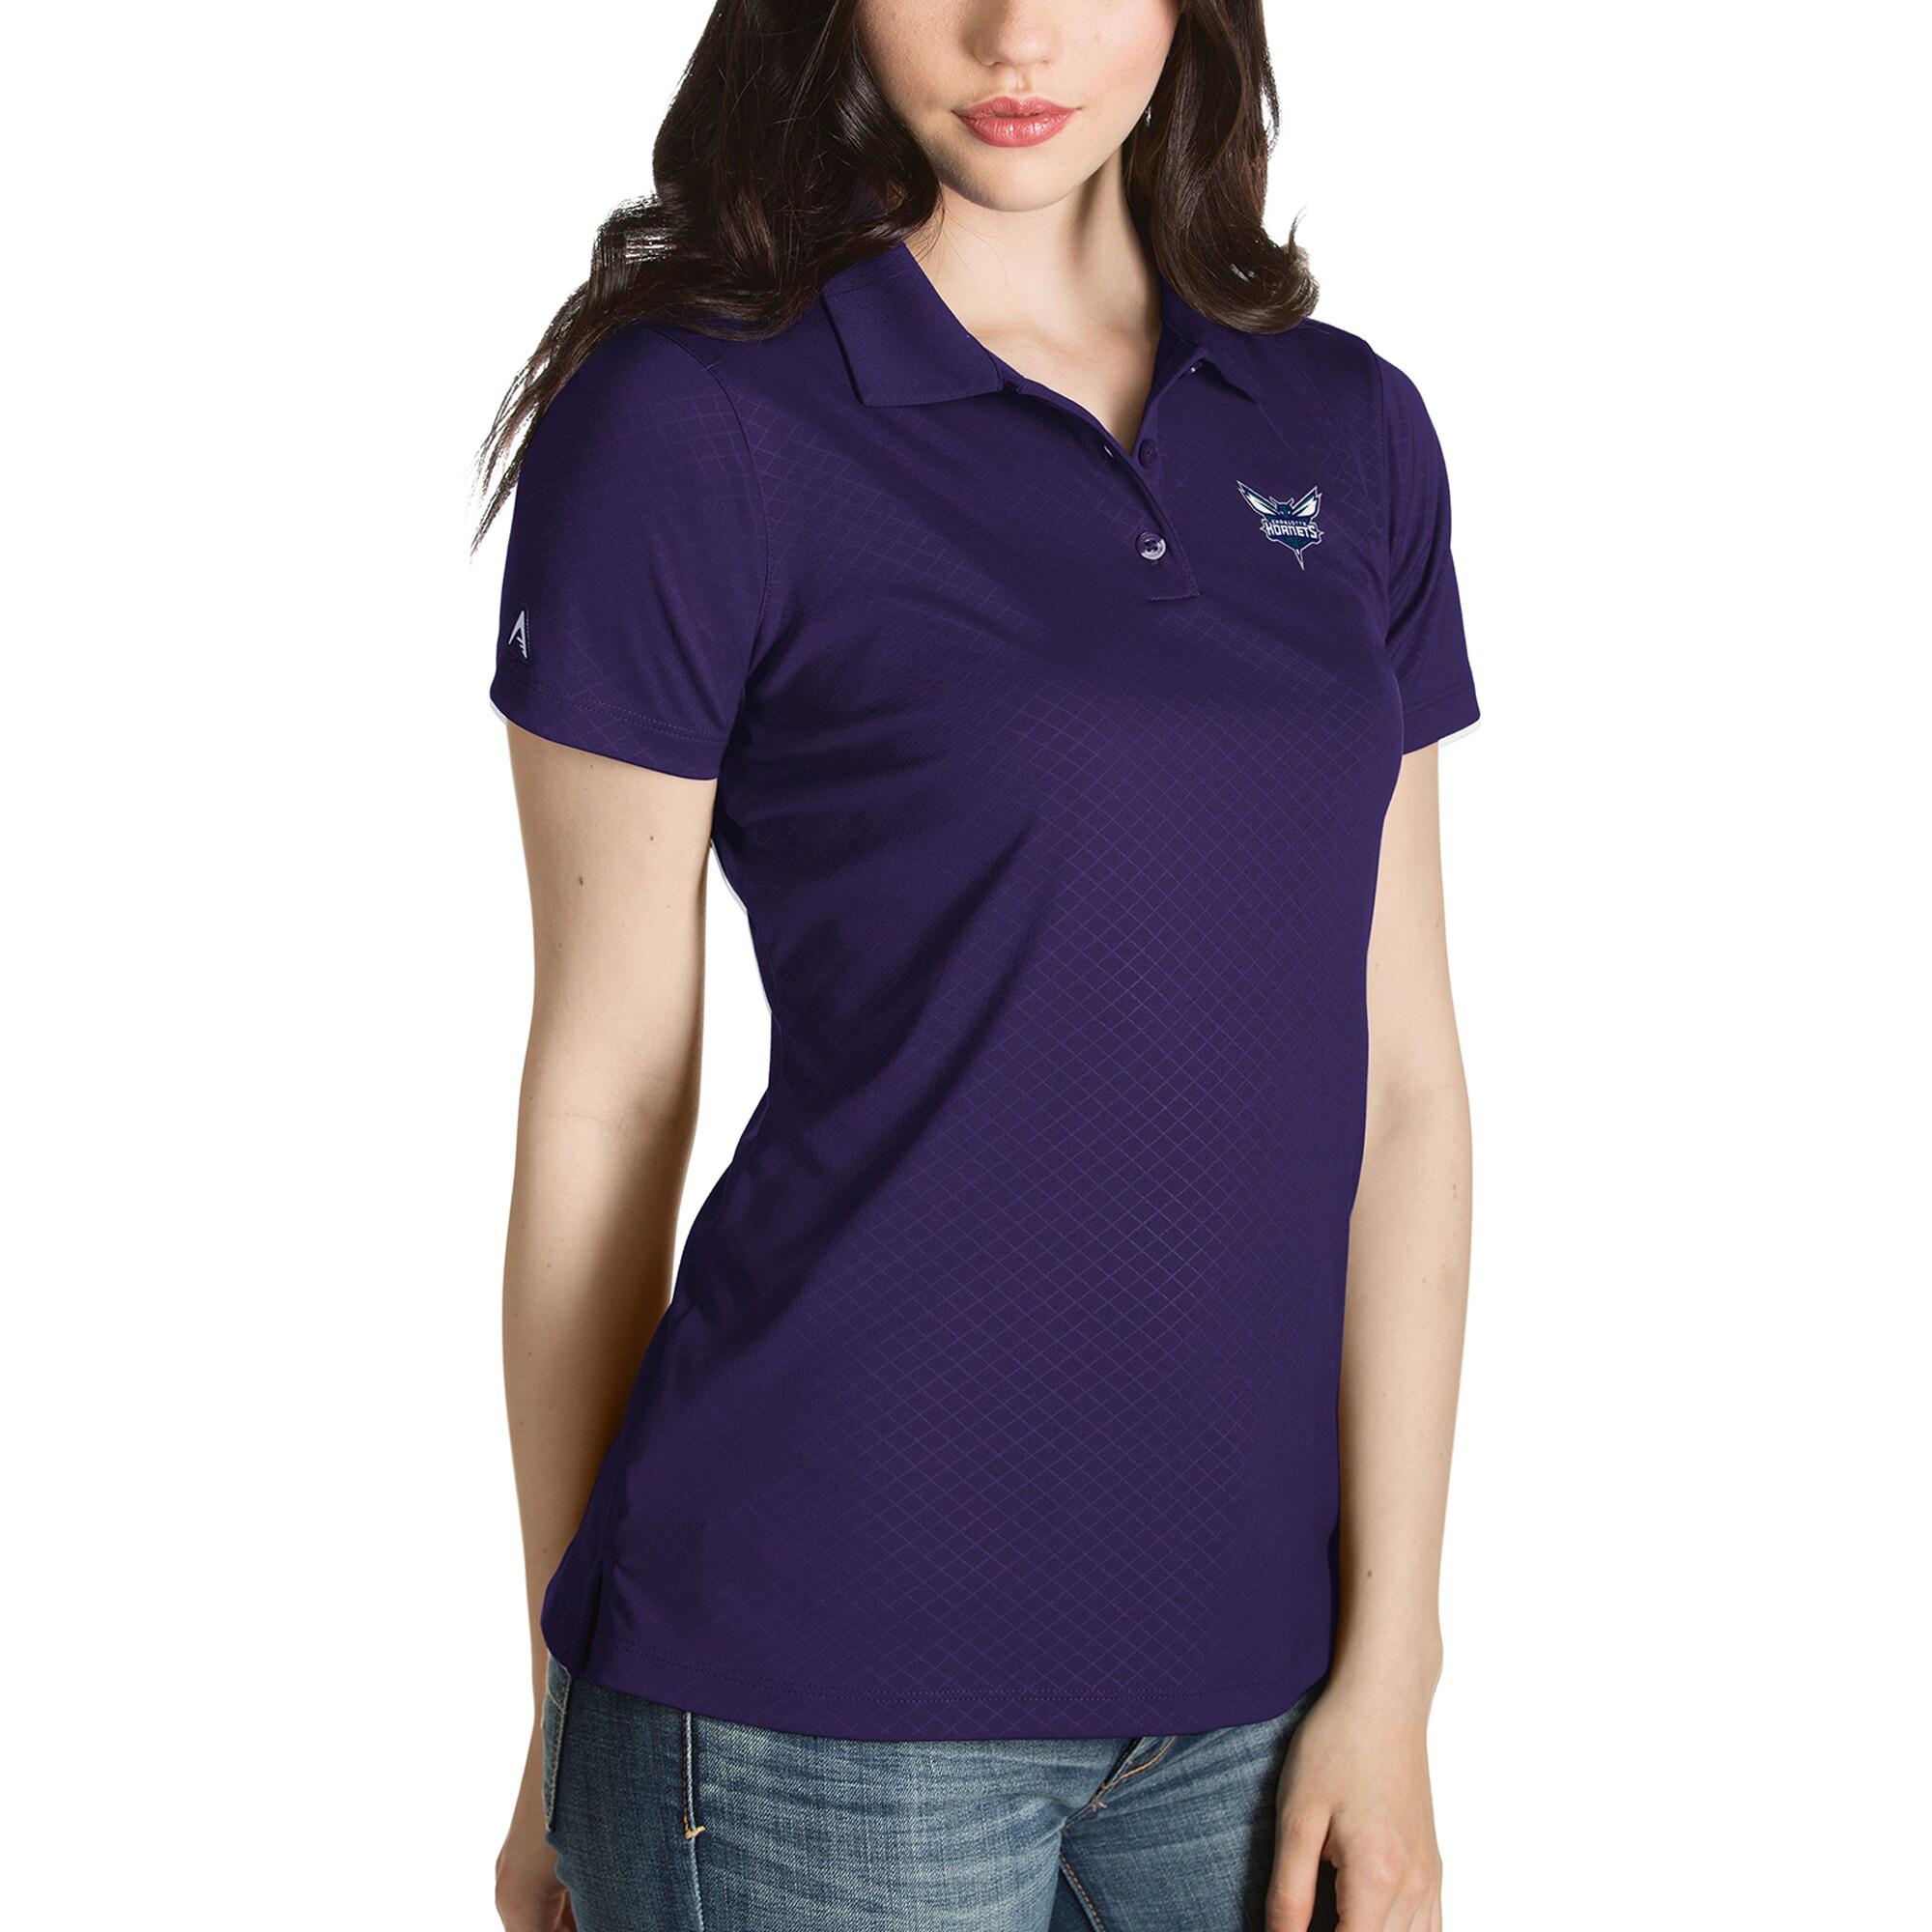 Charlotte Hornets Antigua Women's Inspire Polo - Purple